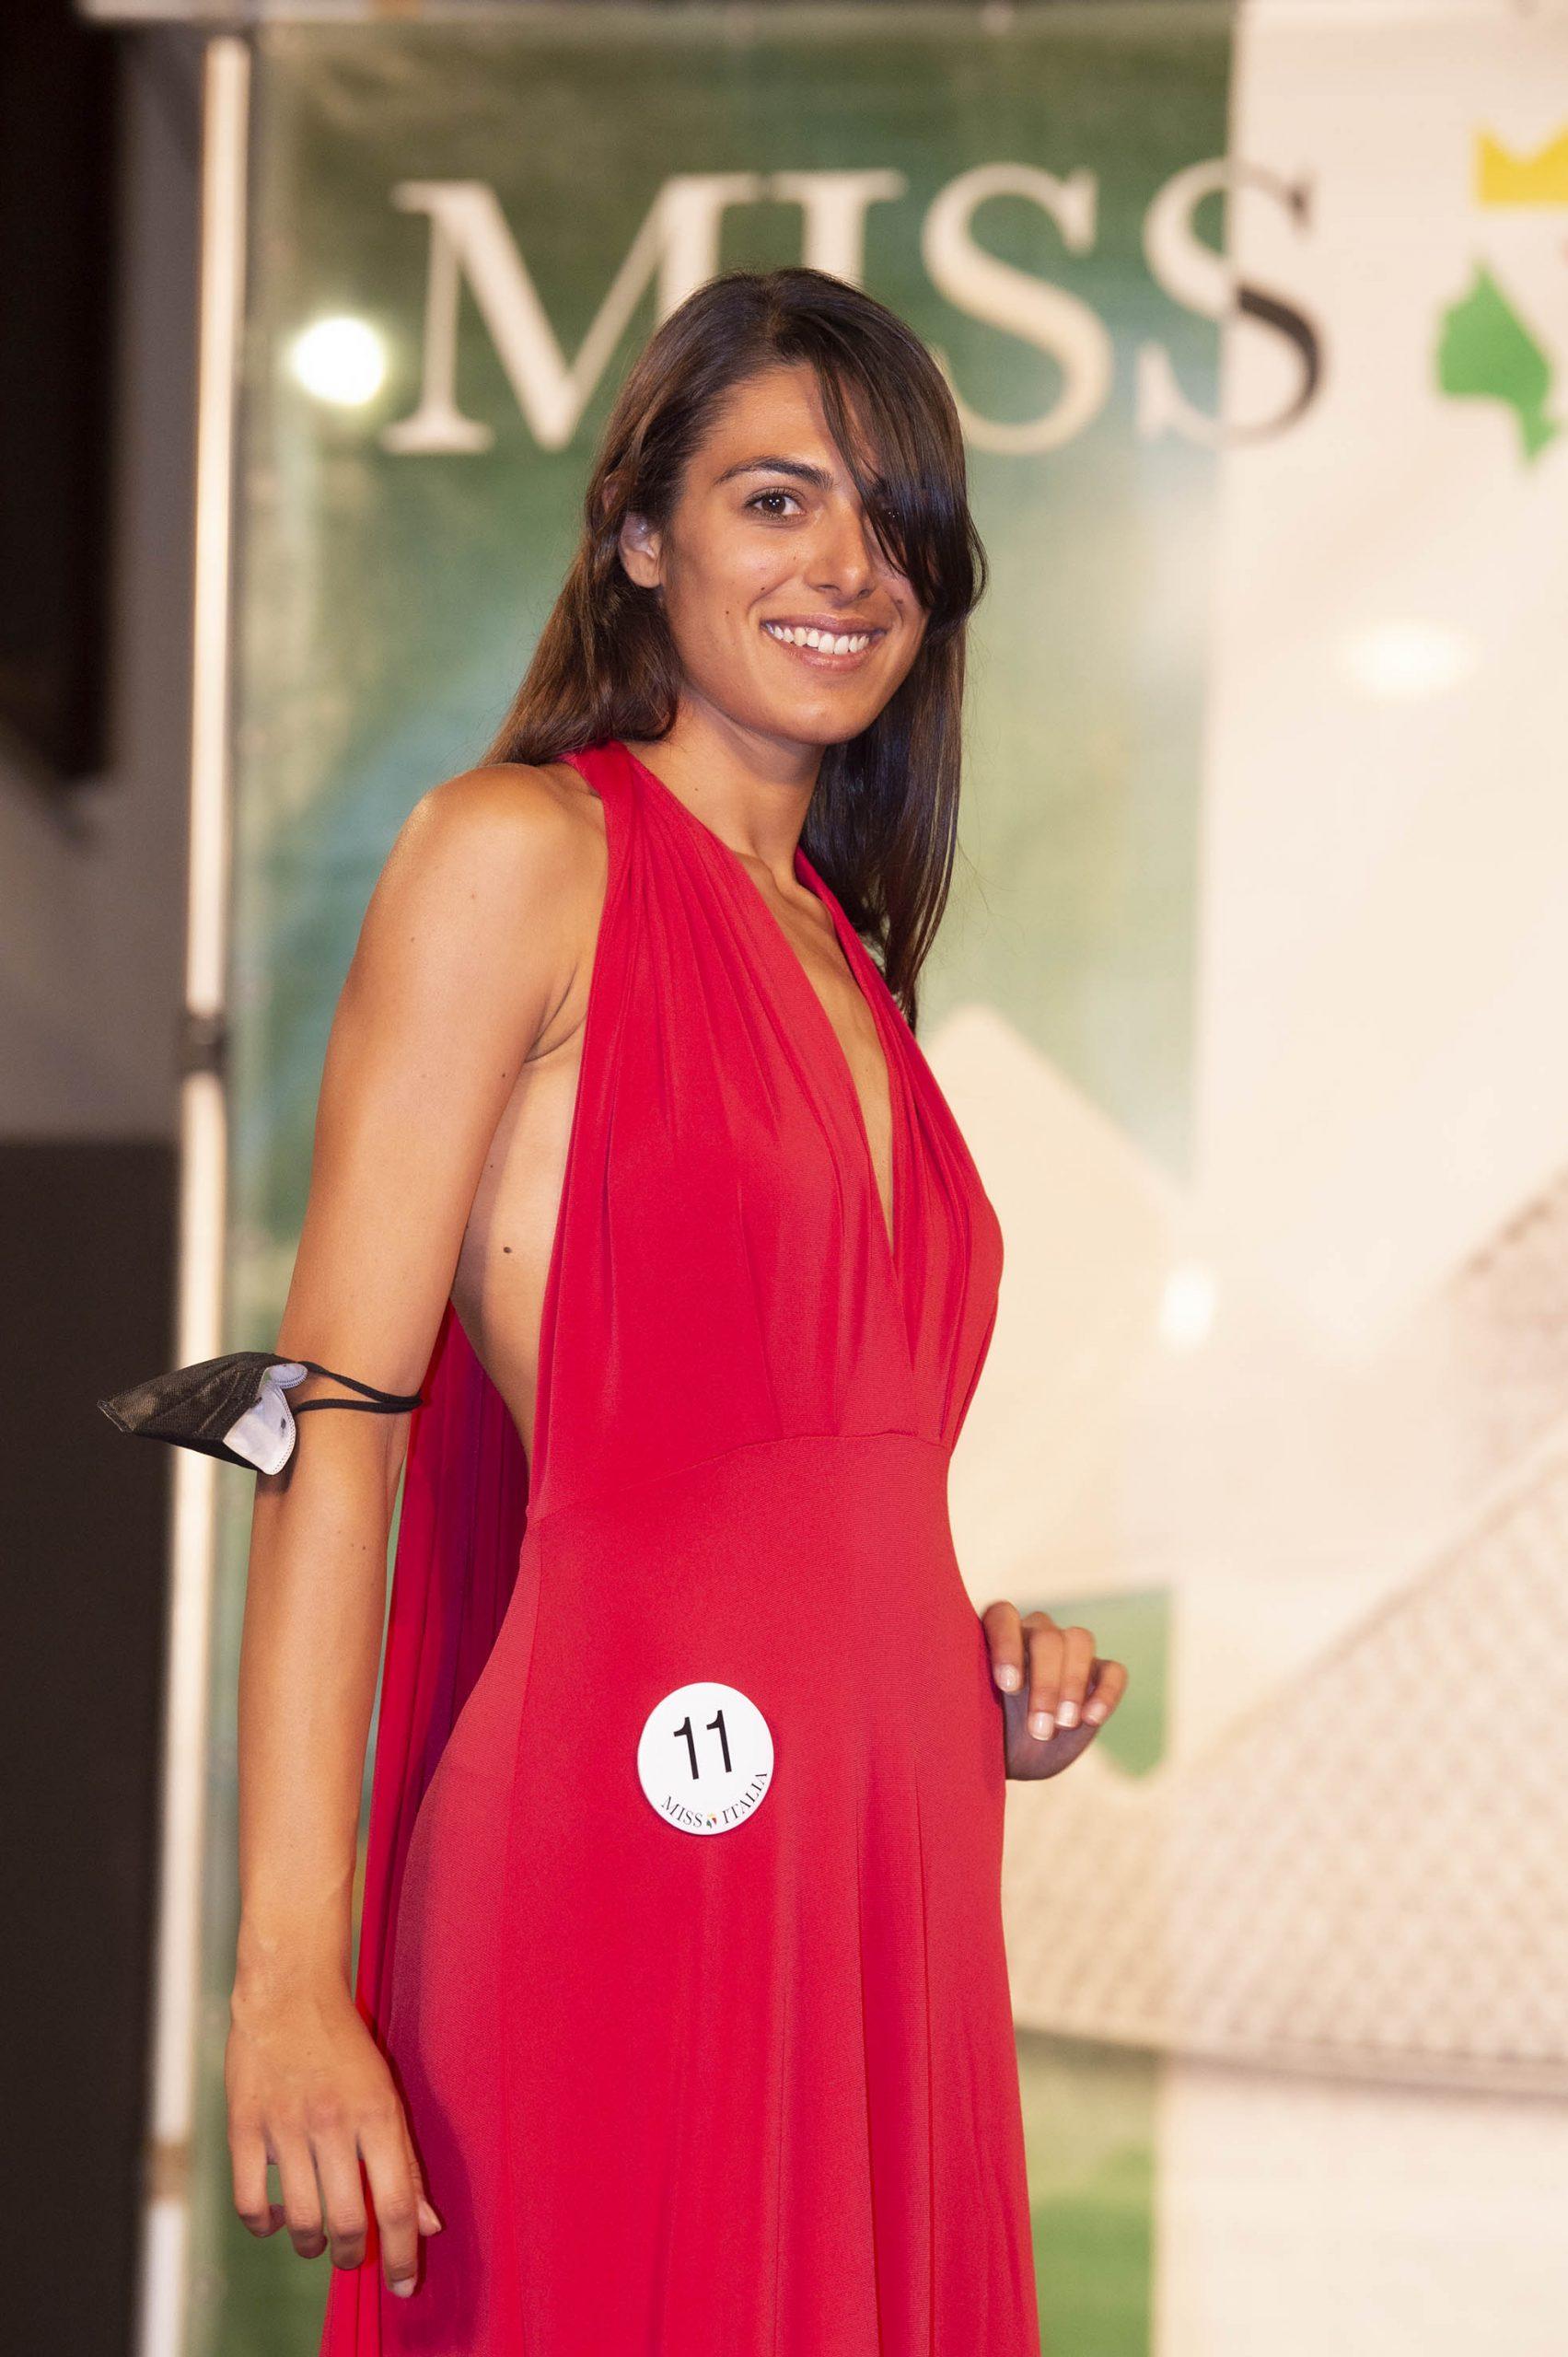 Anna Natali - Miss Miluna FVG - 3